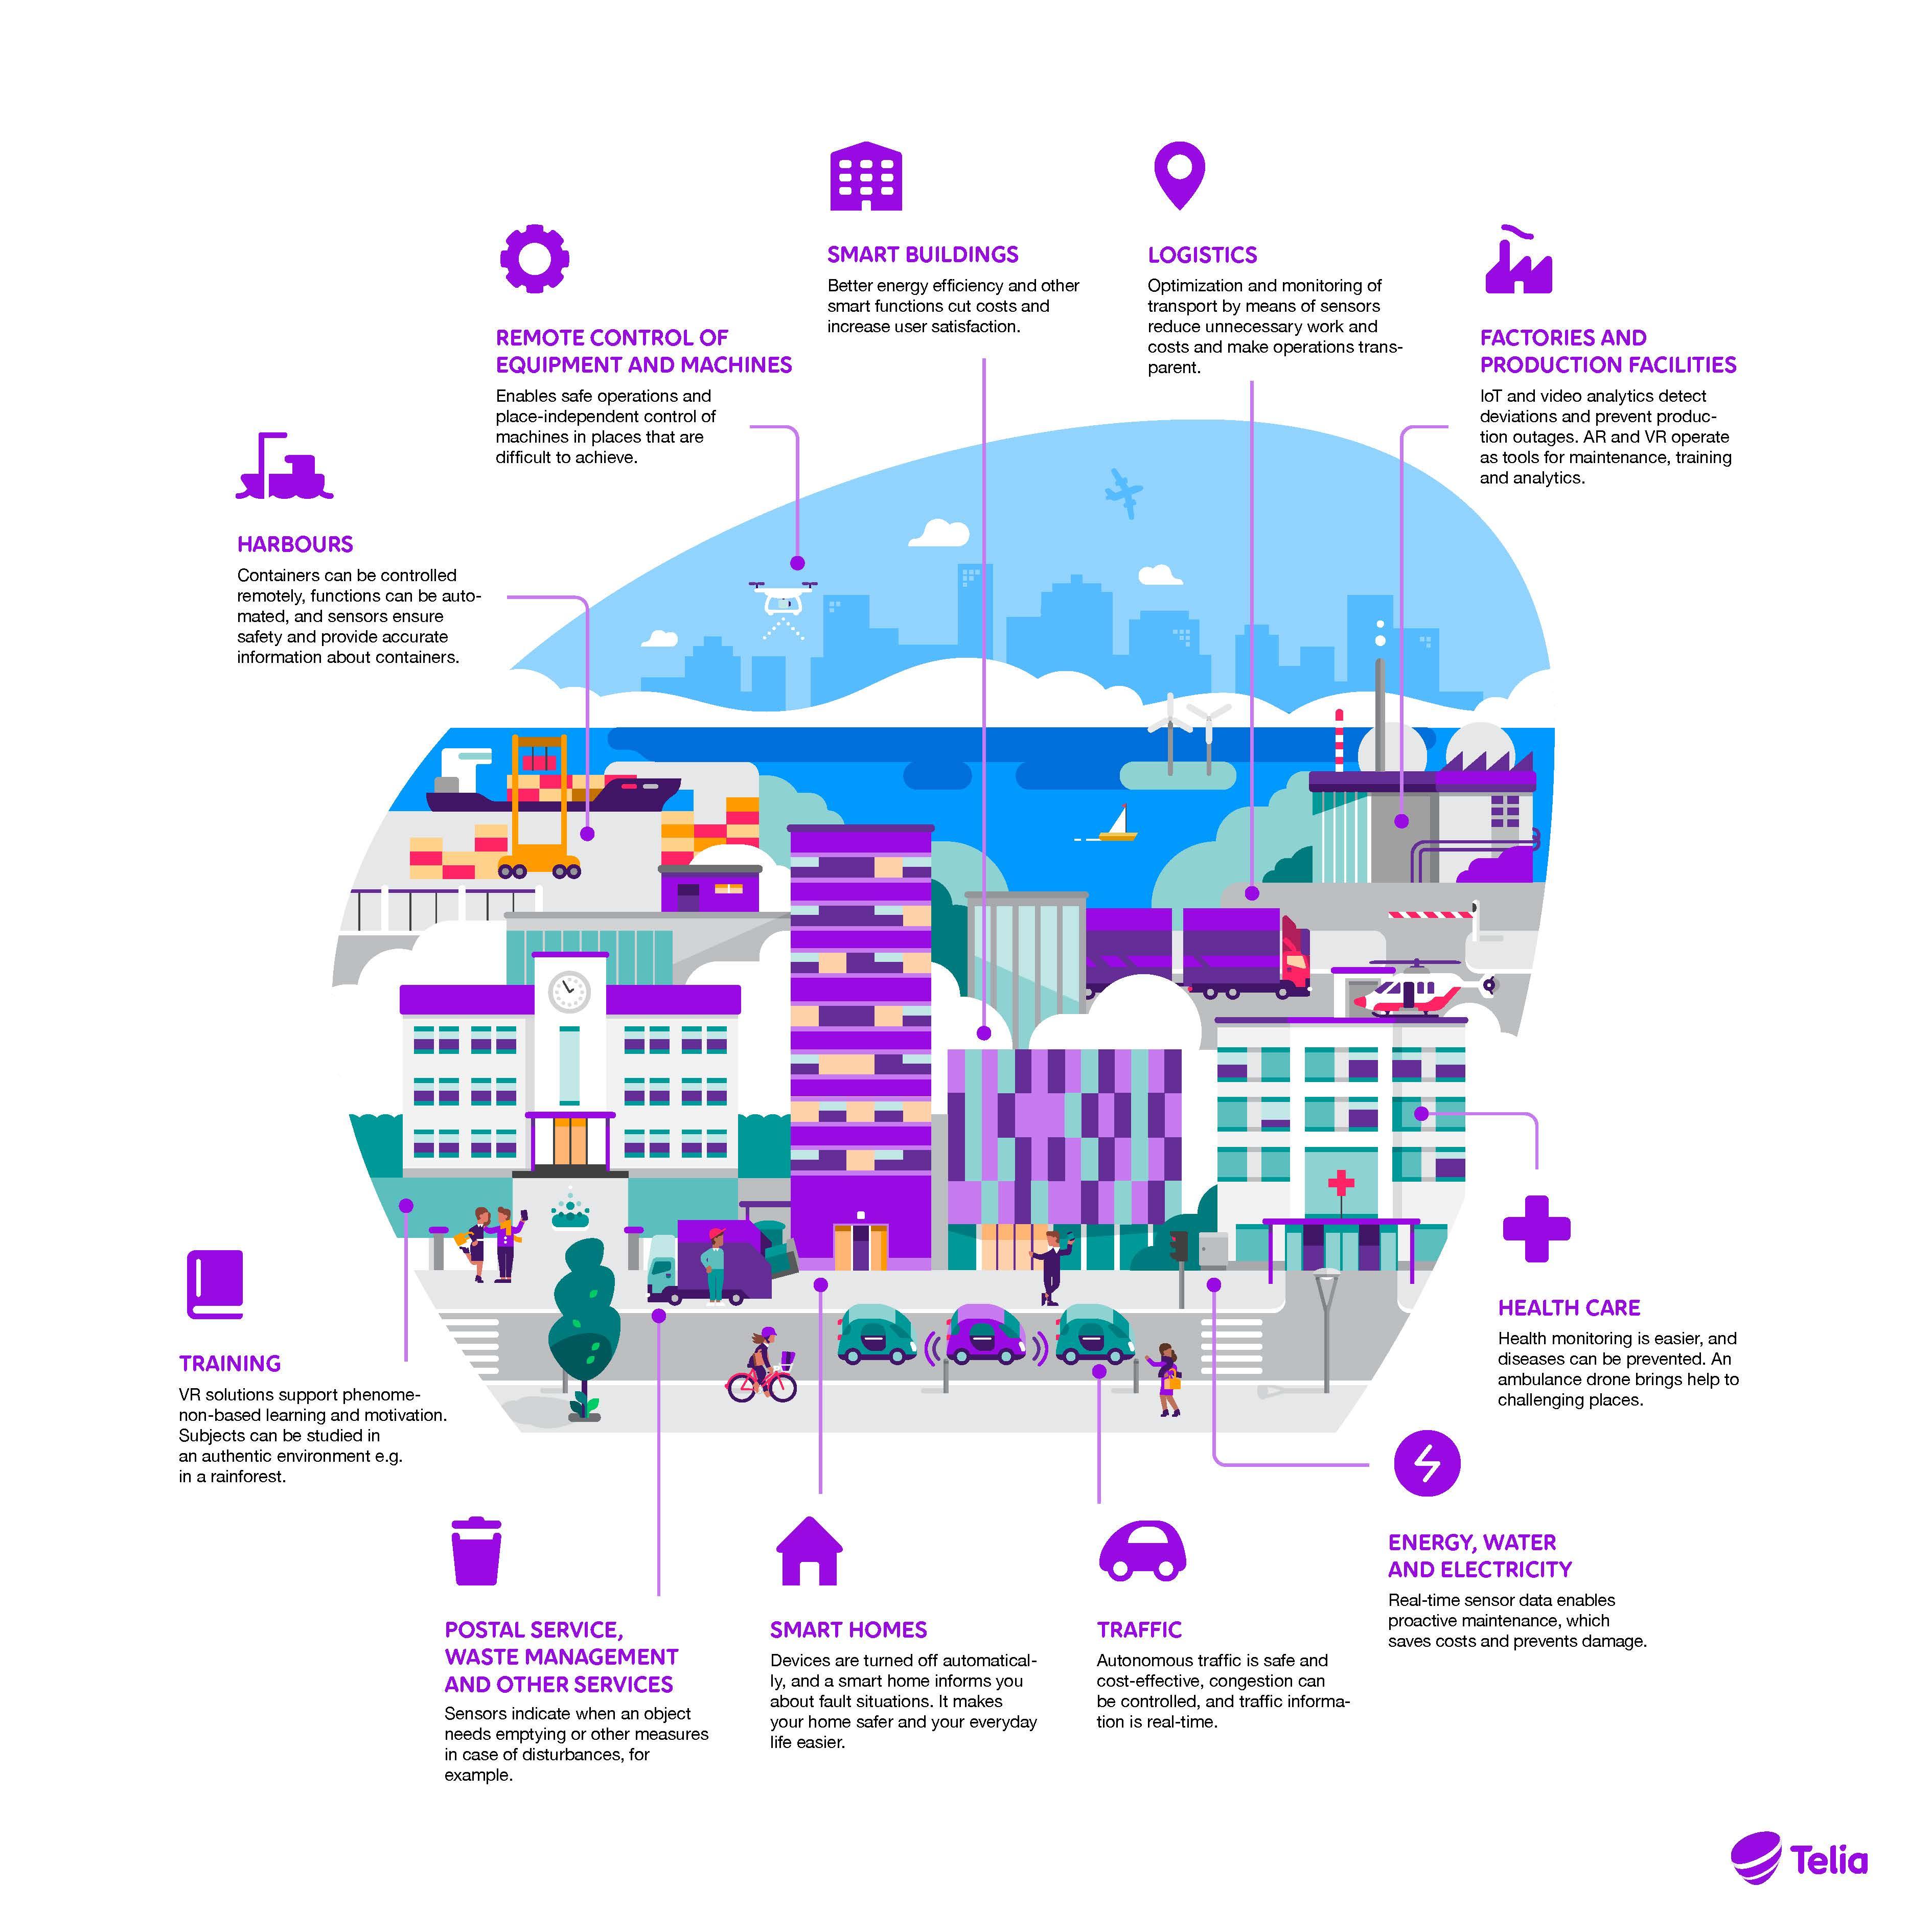 5G Finland - 5G - Telia Business